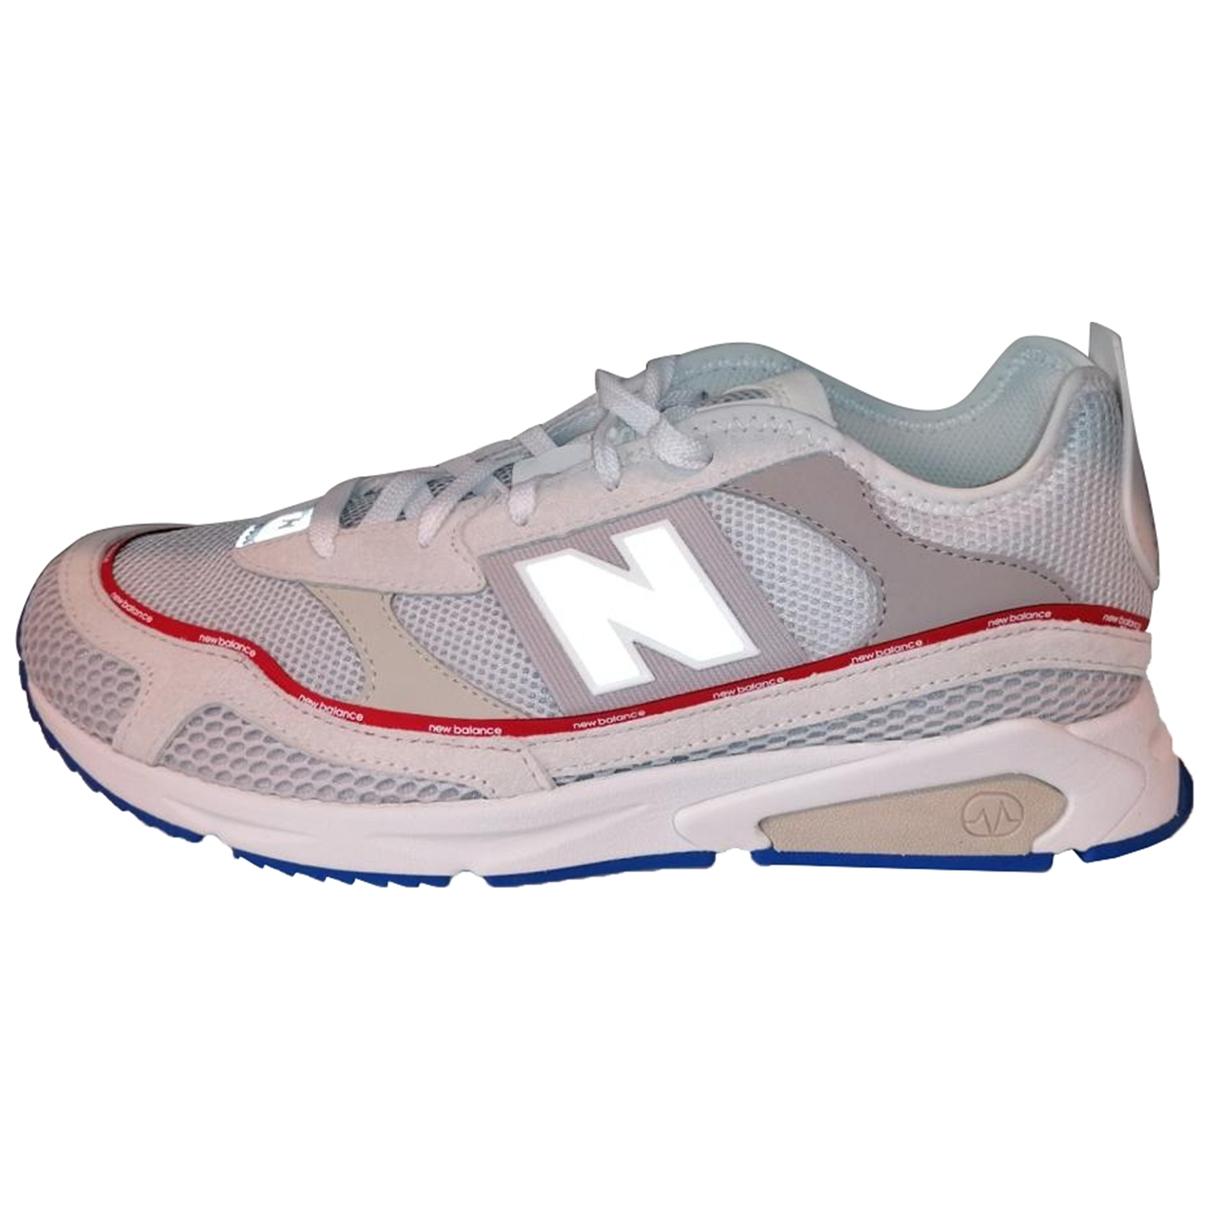 New Balance \N White Cloth Trainers for Men 46.5 EU